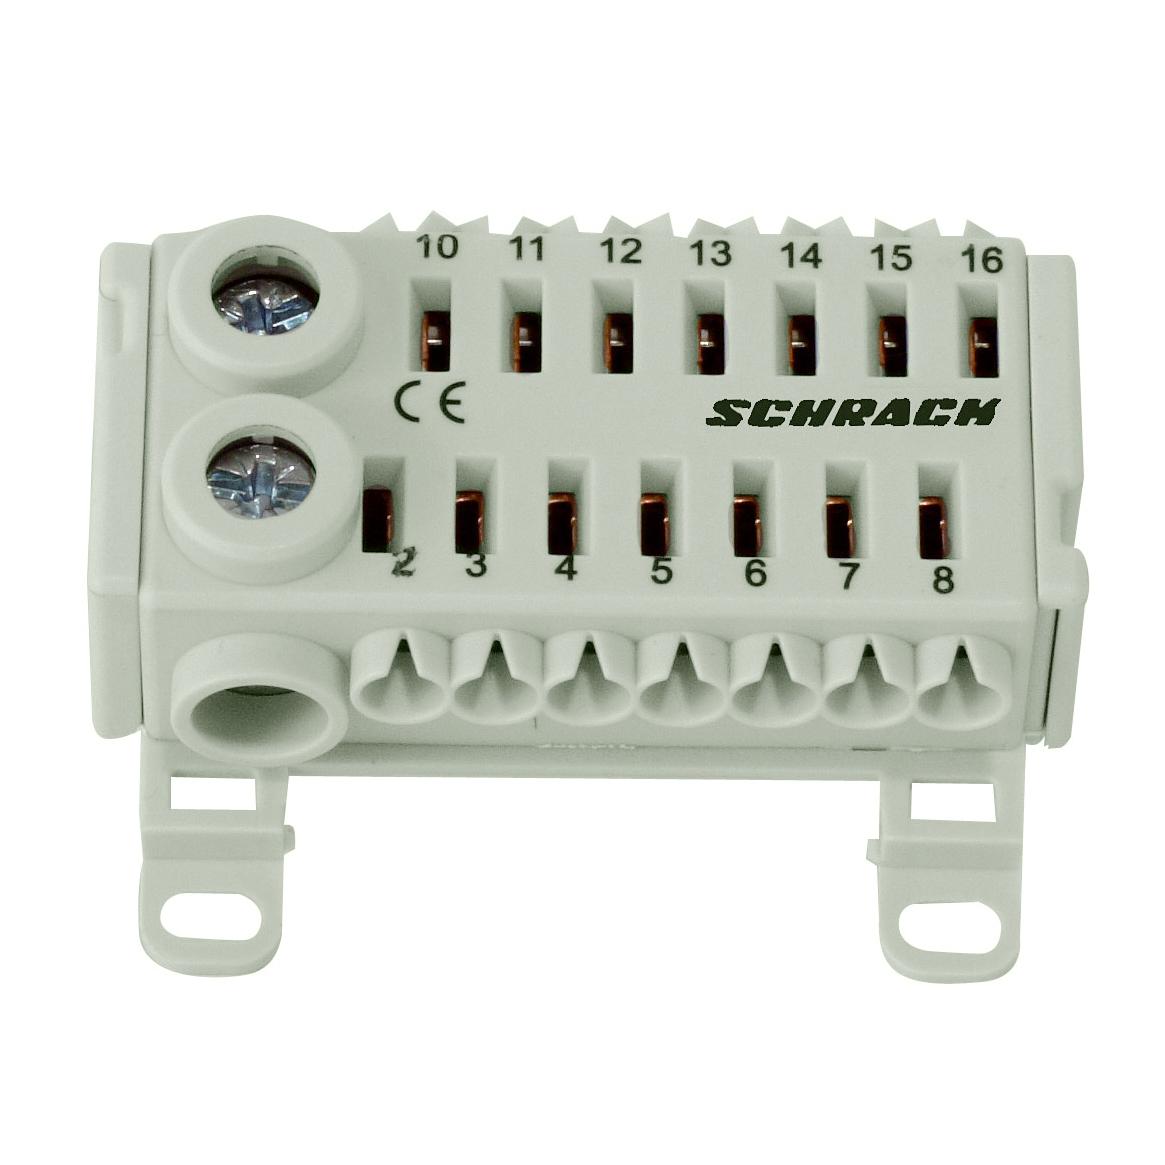 1 Stk EASY CONNECTION BOX schwarz/weiss, 2 x 25 mm², 14 x 4 mm² IK021081--